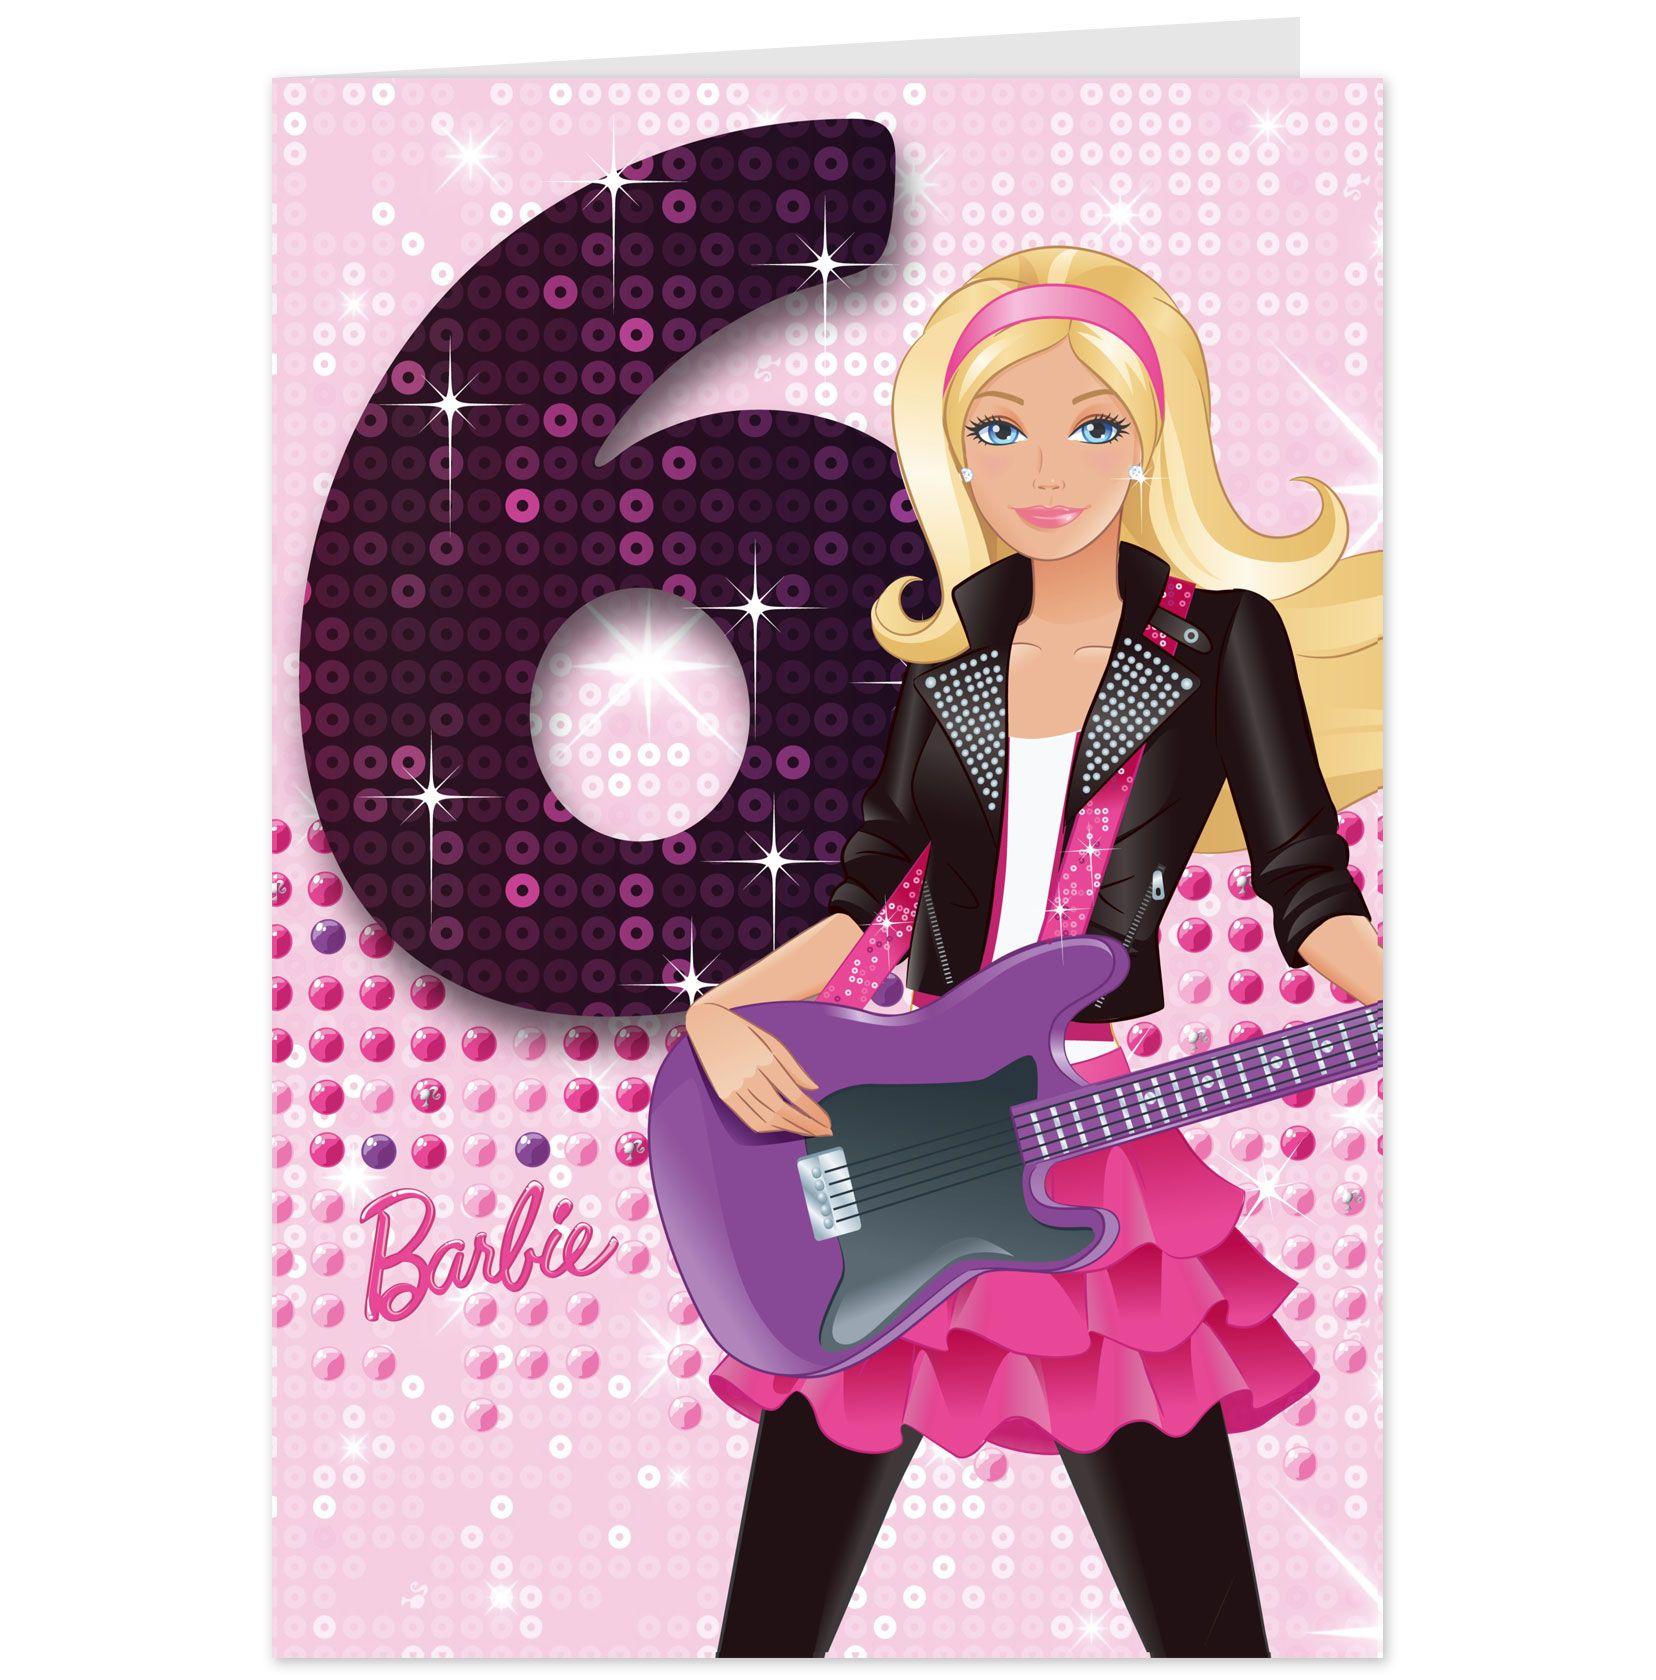 Barbie 6th birthday card personalised hallmark aus parties barbie 6th birthday card personalised hallmark aus bookmarktalkfo Images